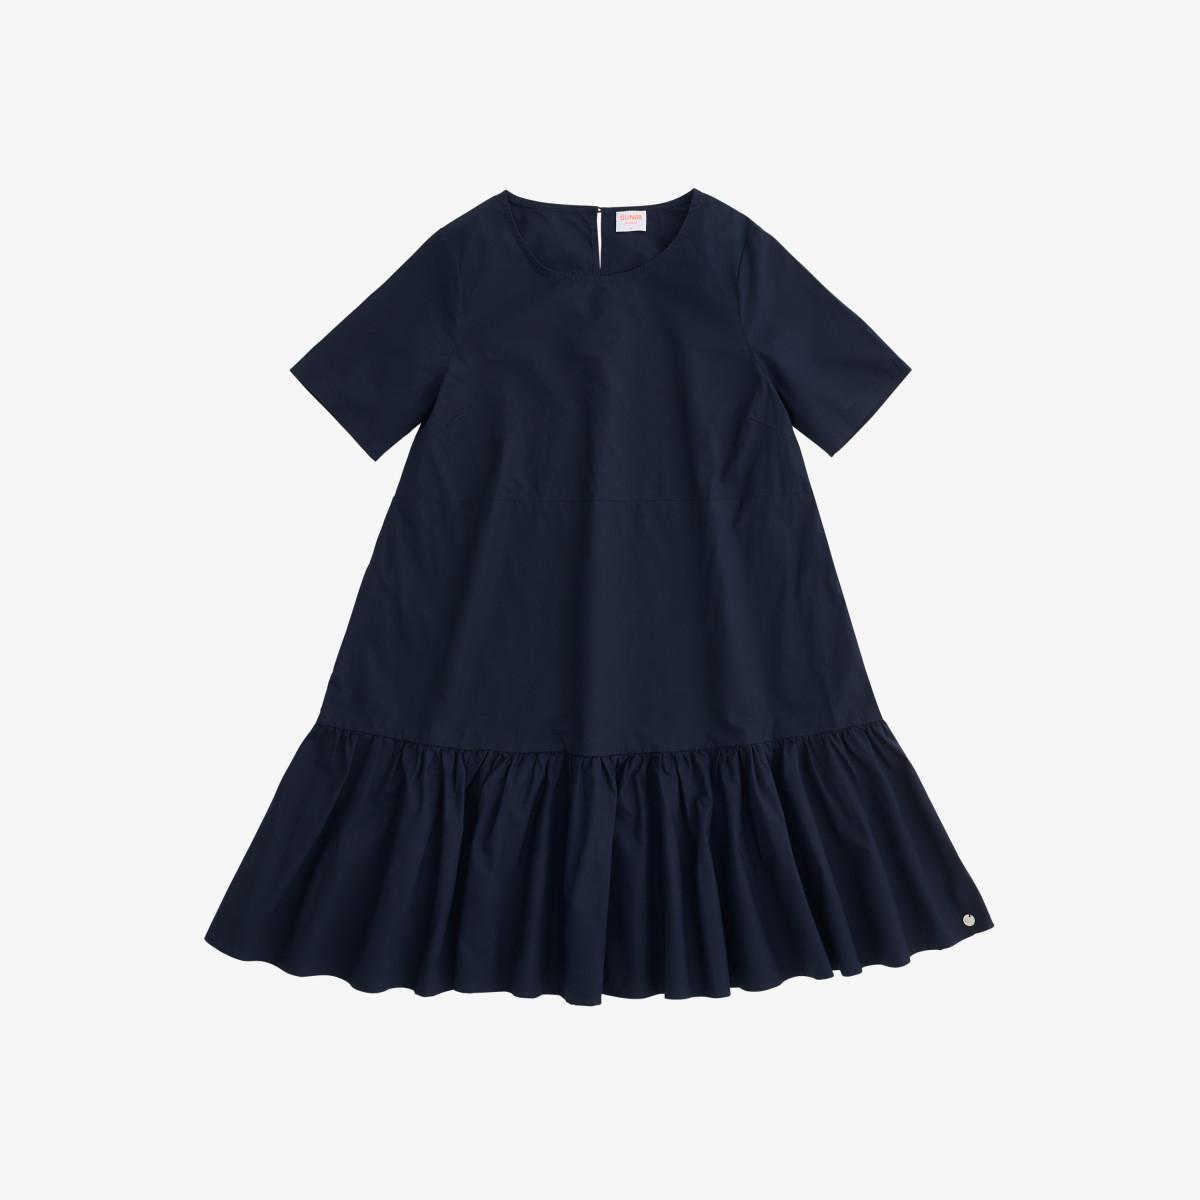 DRESS S/S NAVY BLUE